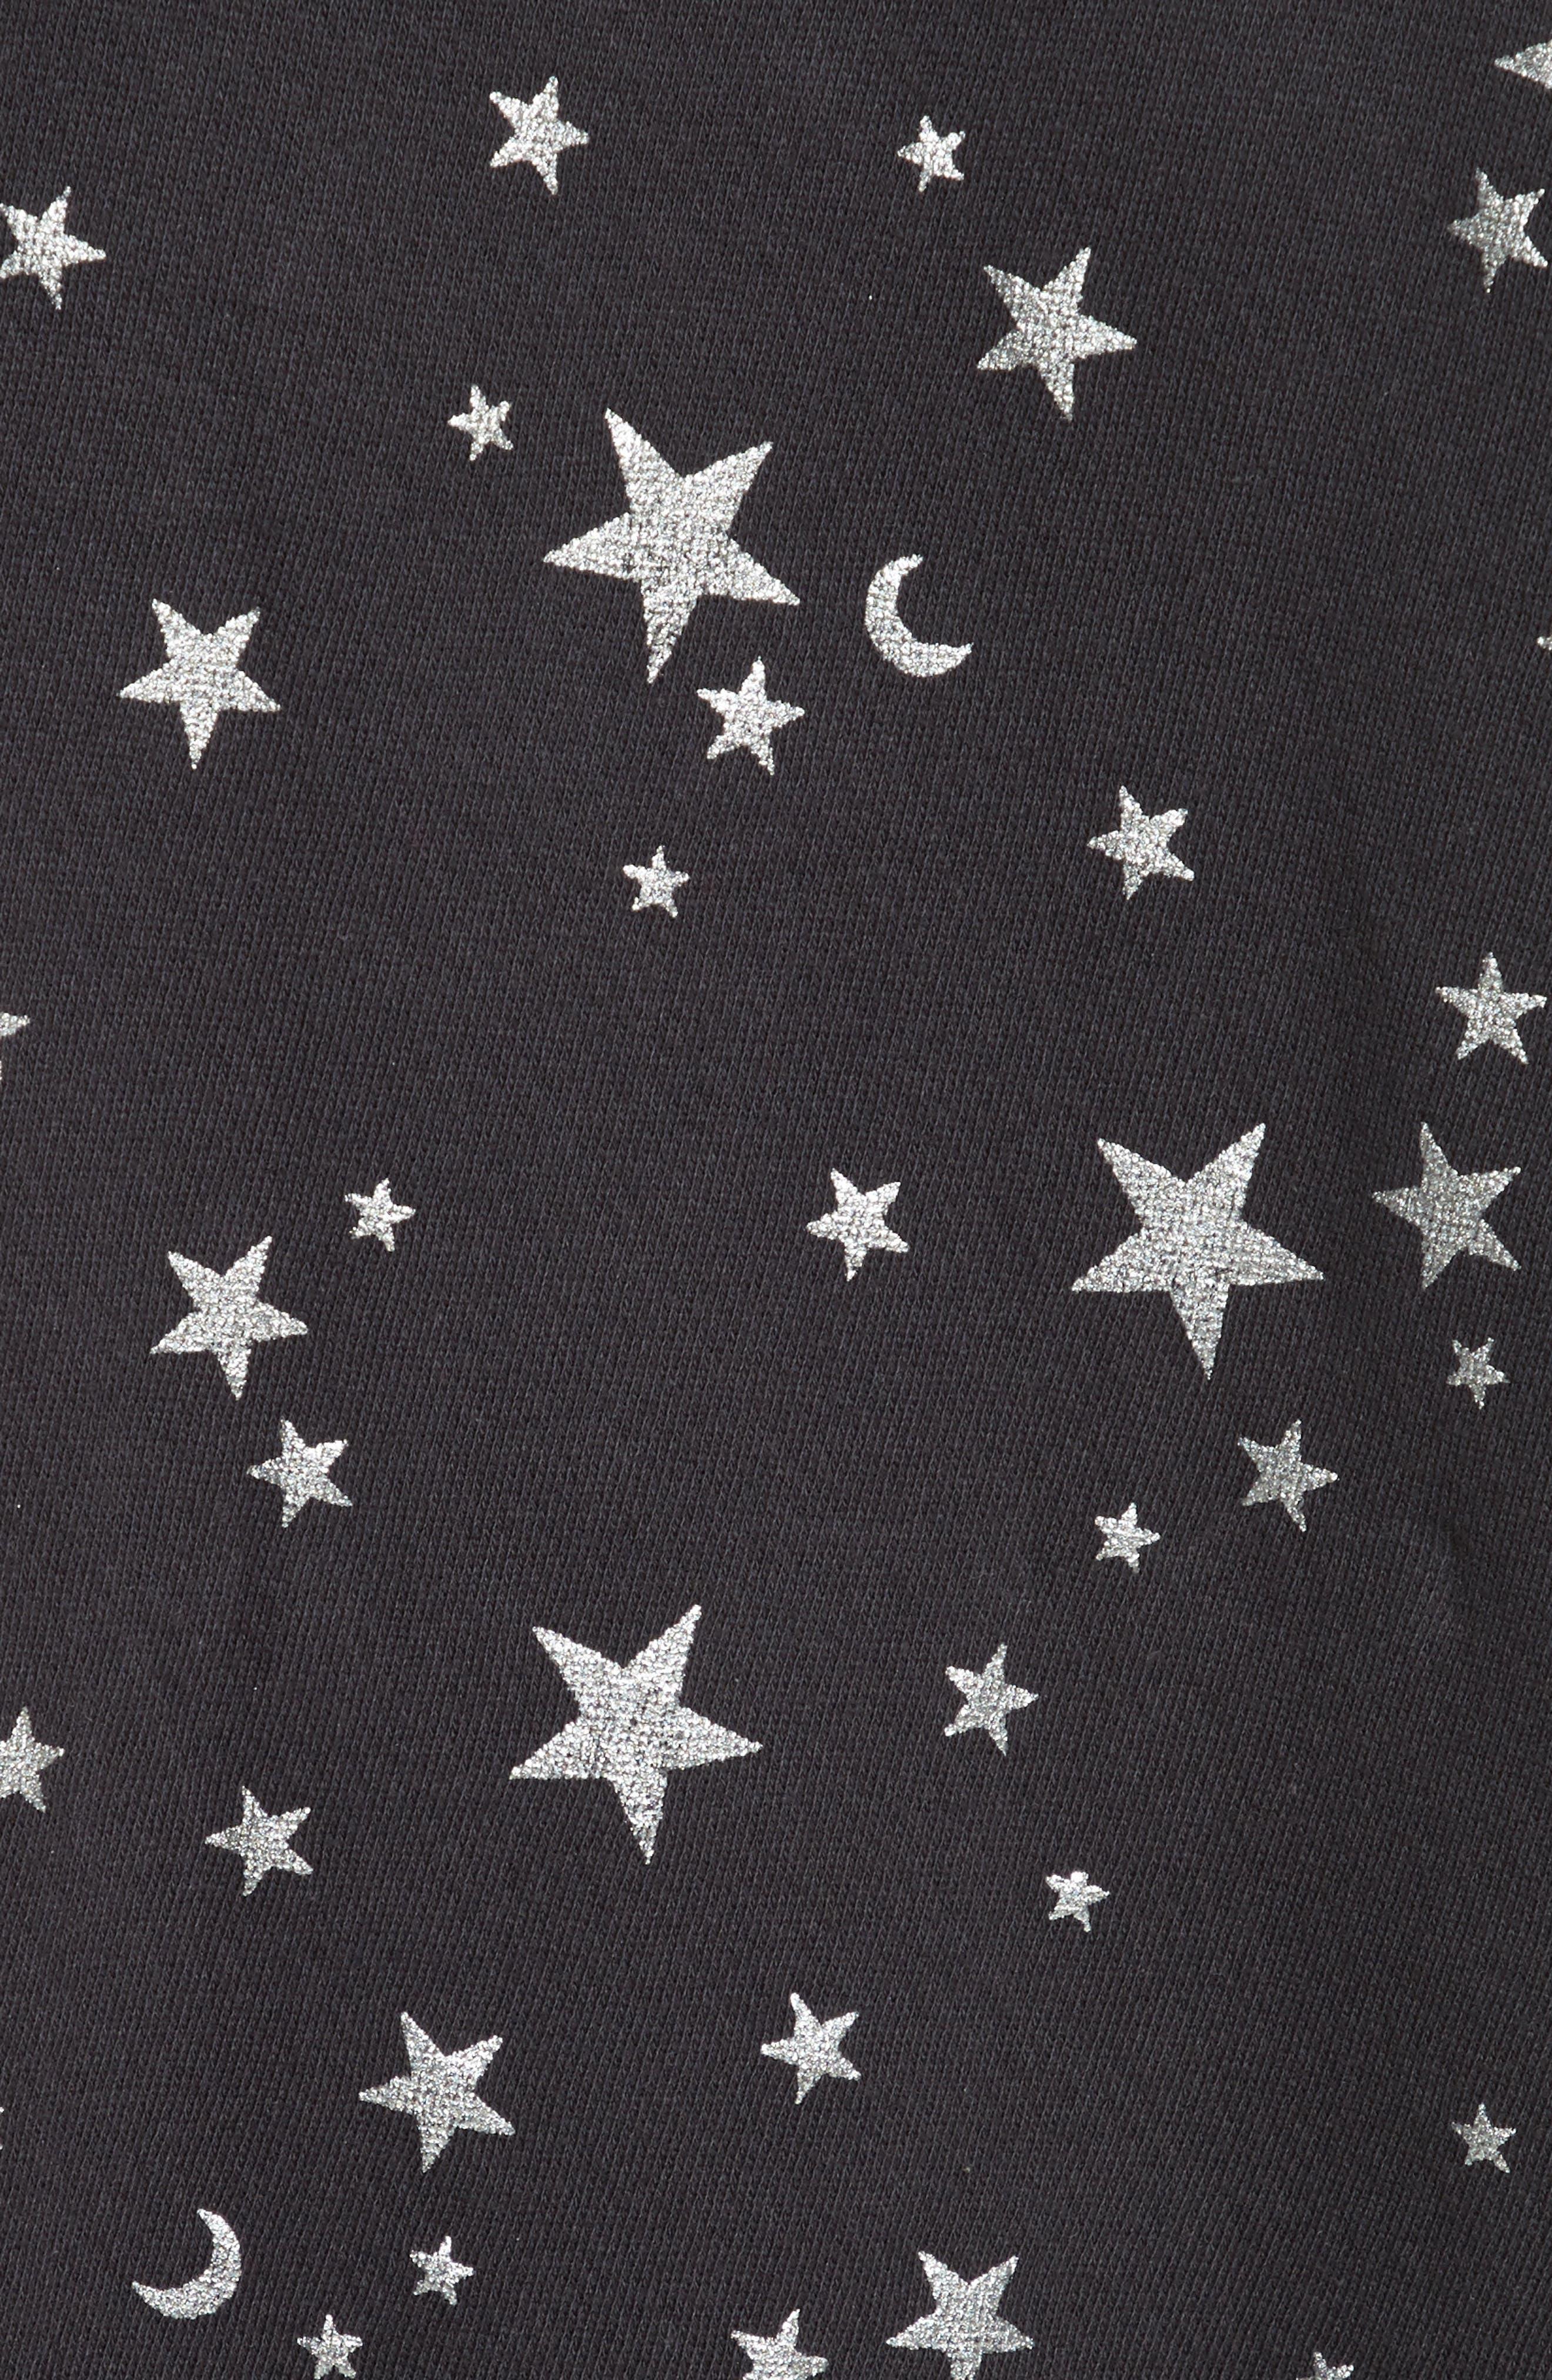 Edrie Foil Print Sweatshirt,                             Alternate thumbnail 5, color,                             002